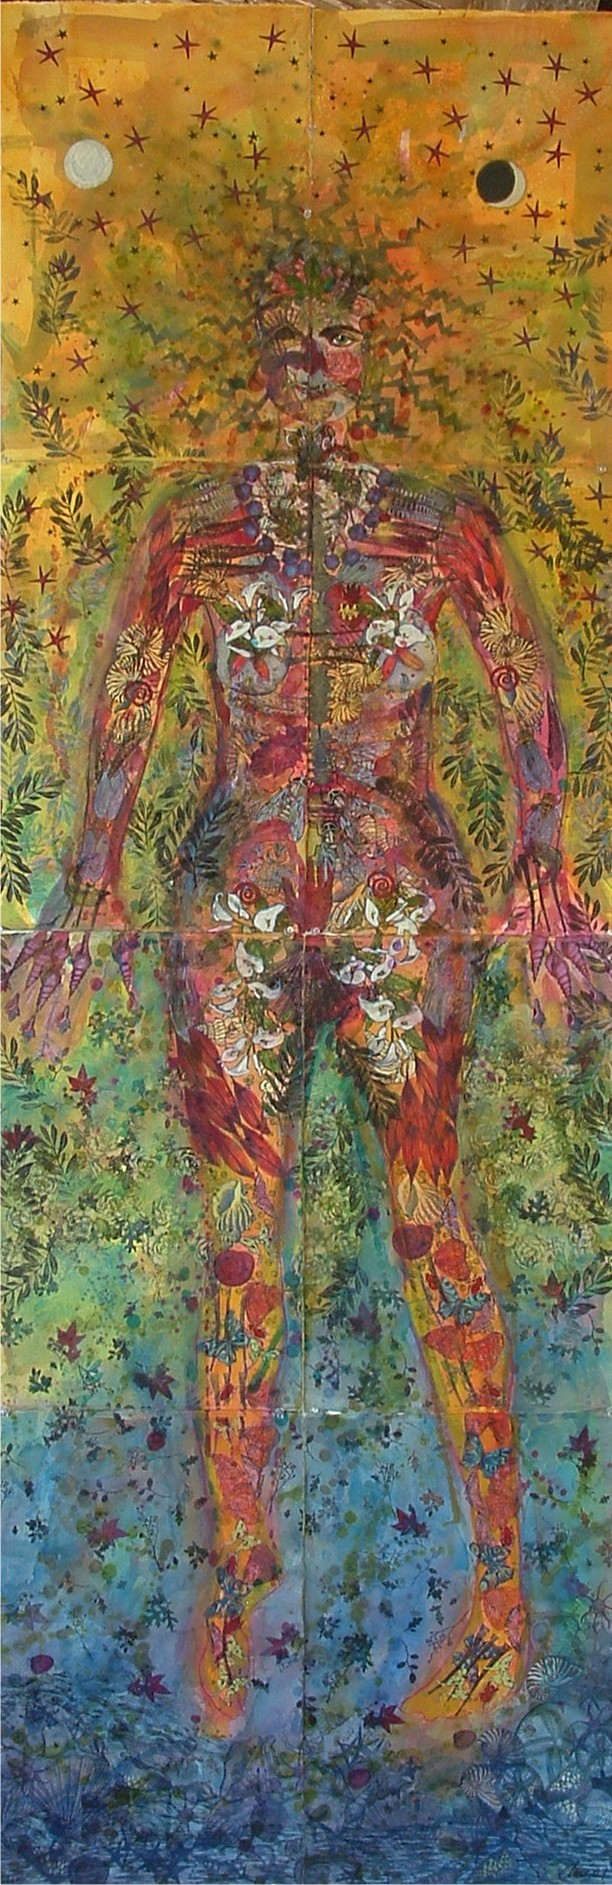 Eve Halena Cline source: the artist